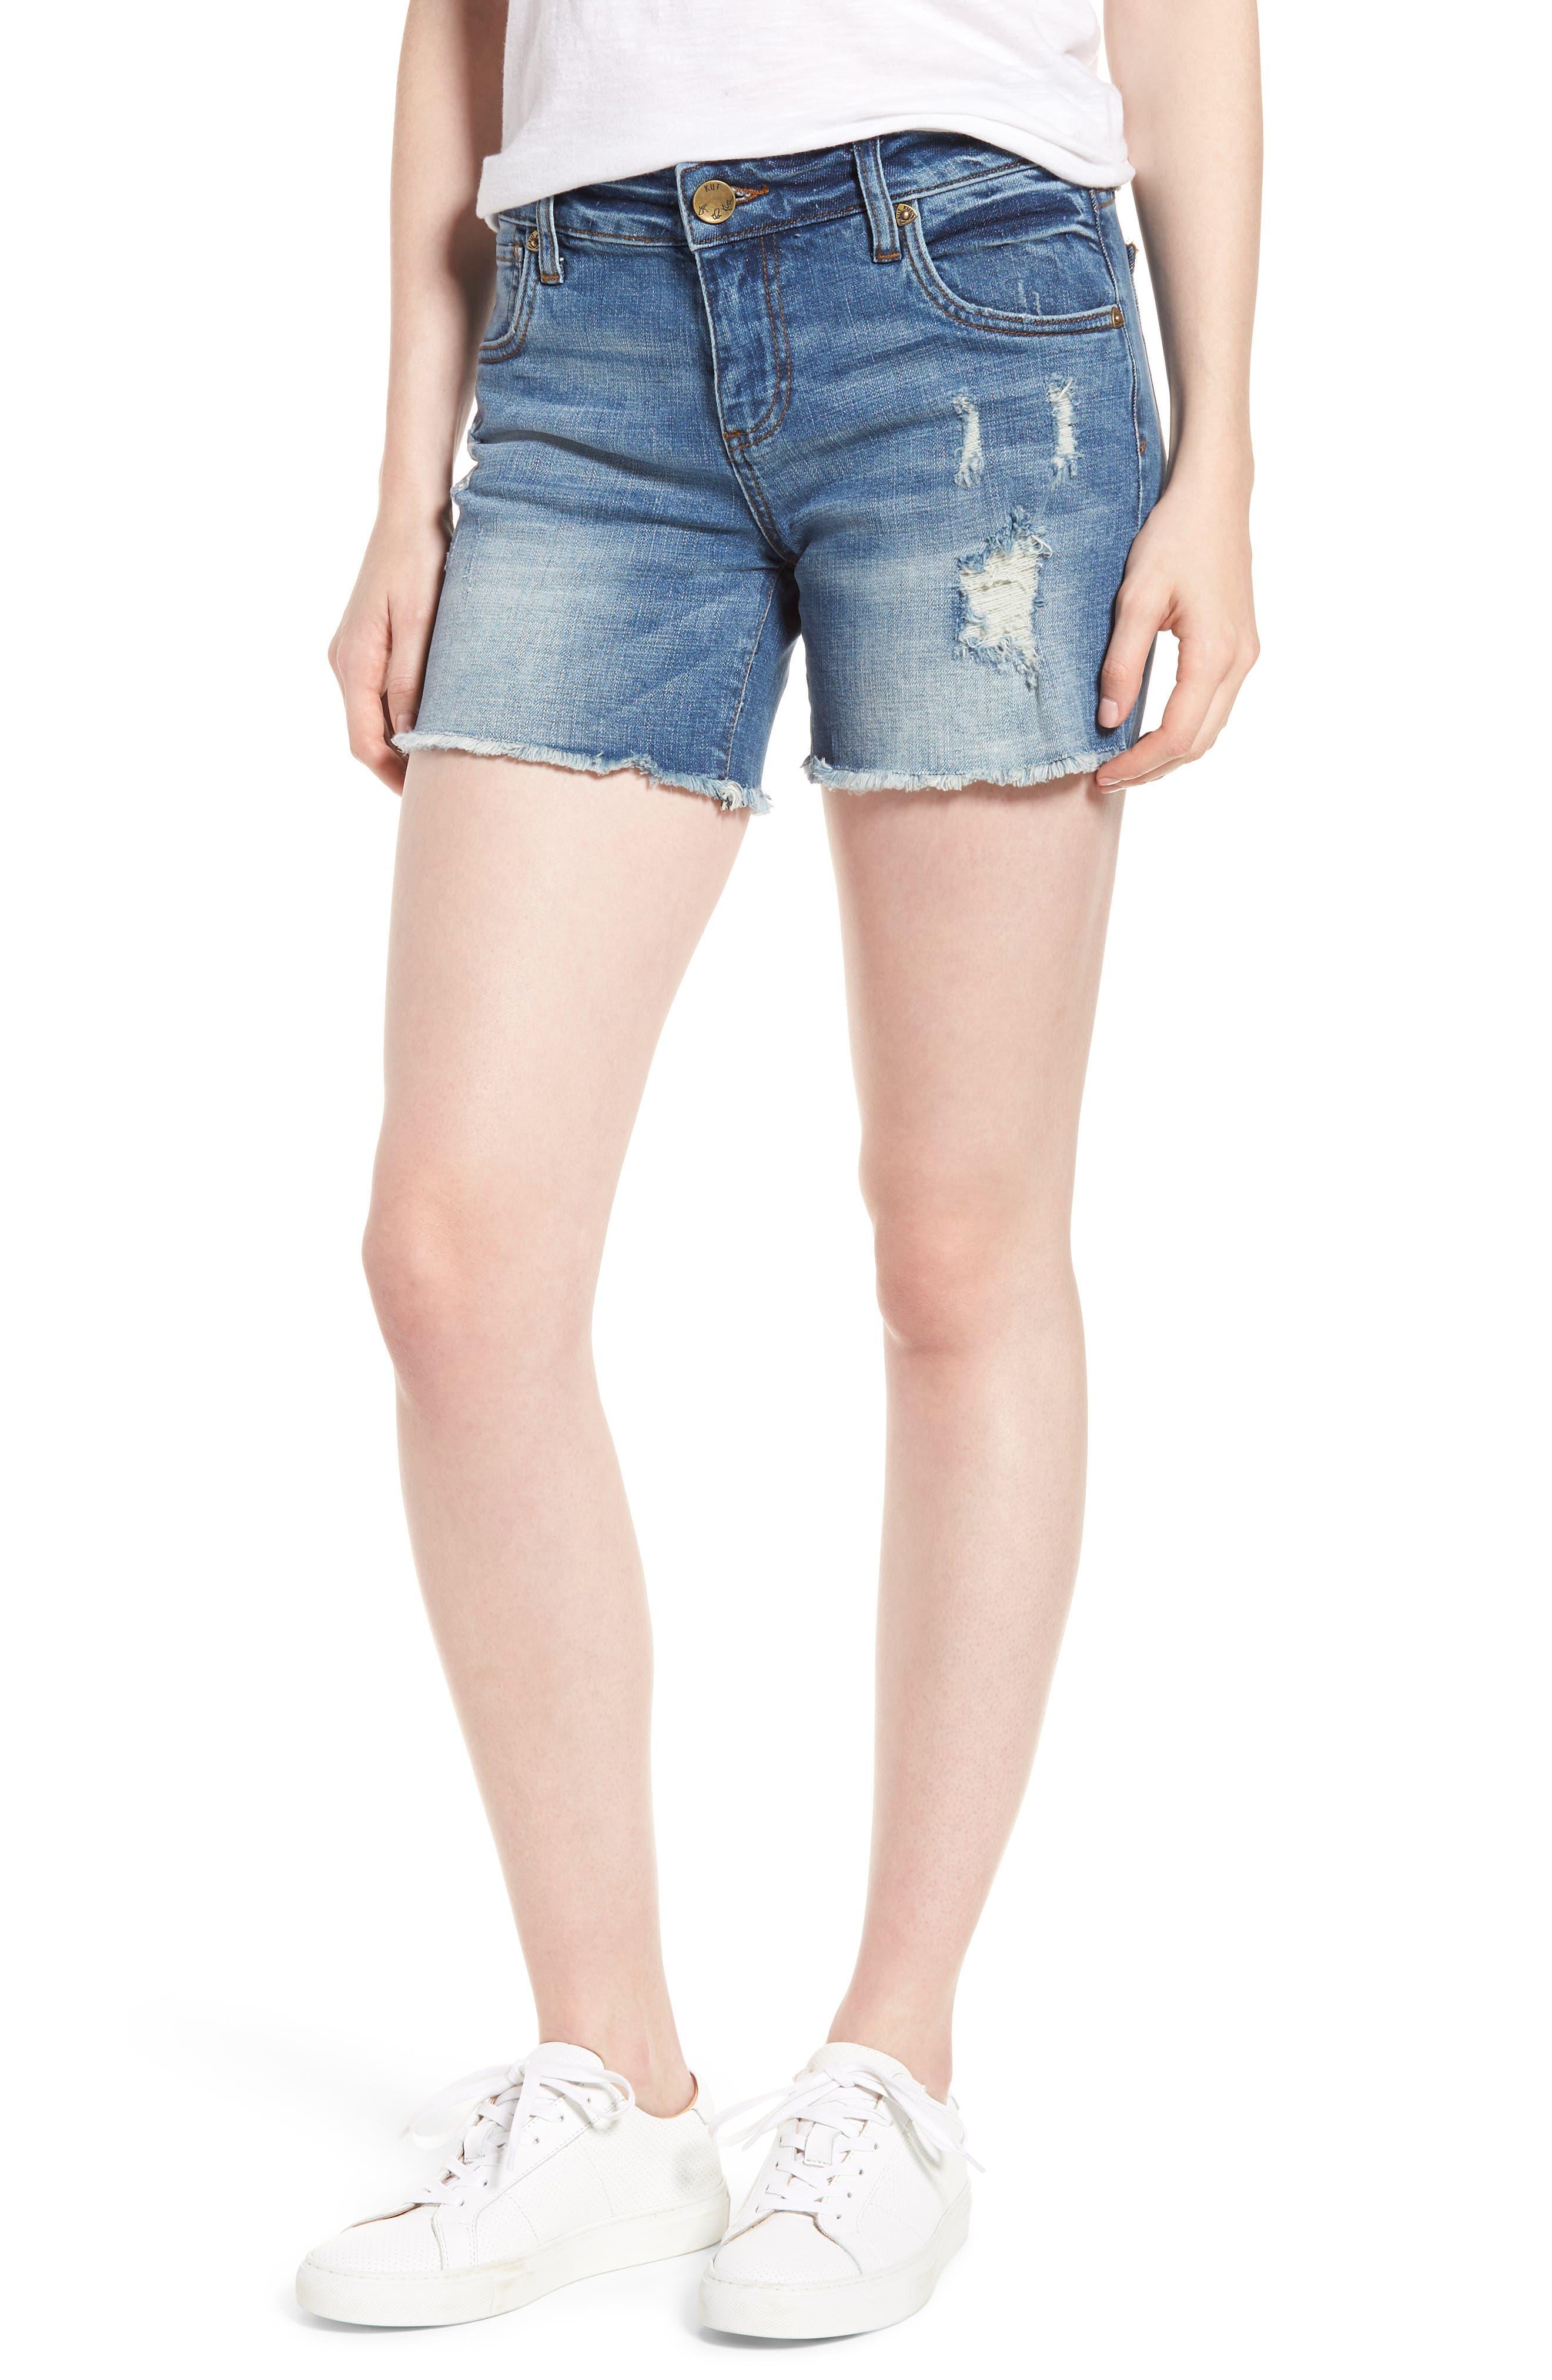 Kut from the Kloth Gidget Distressed Denim Shorts (Constructive)